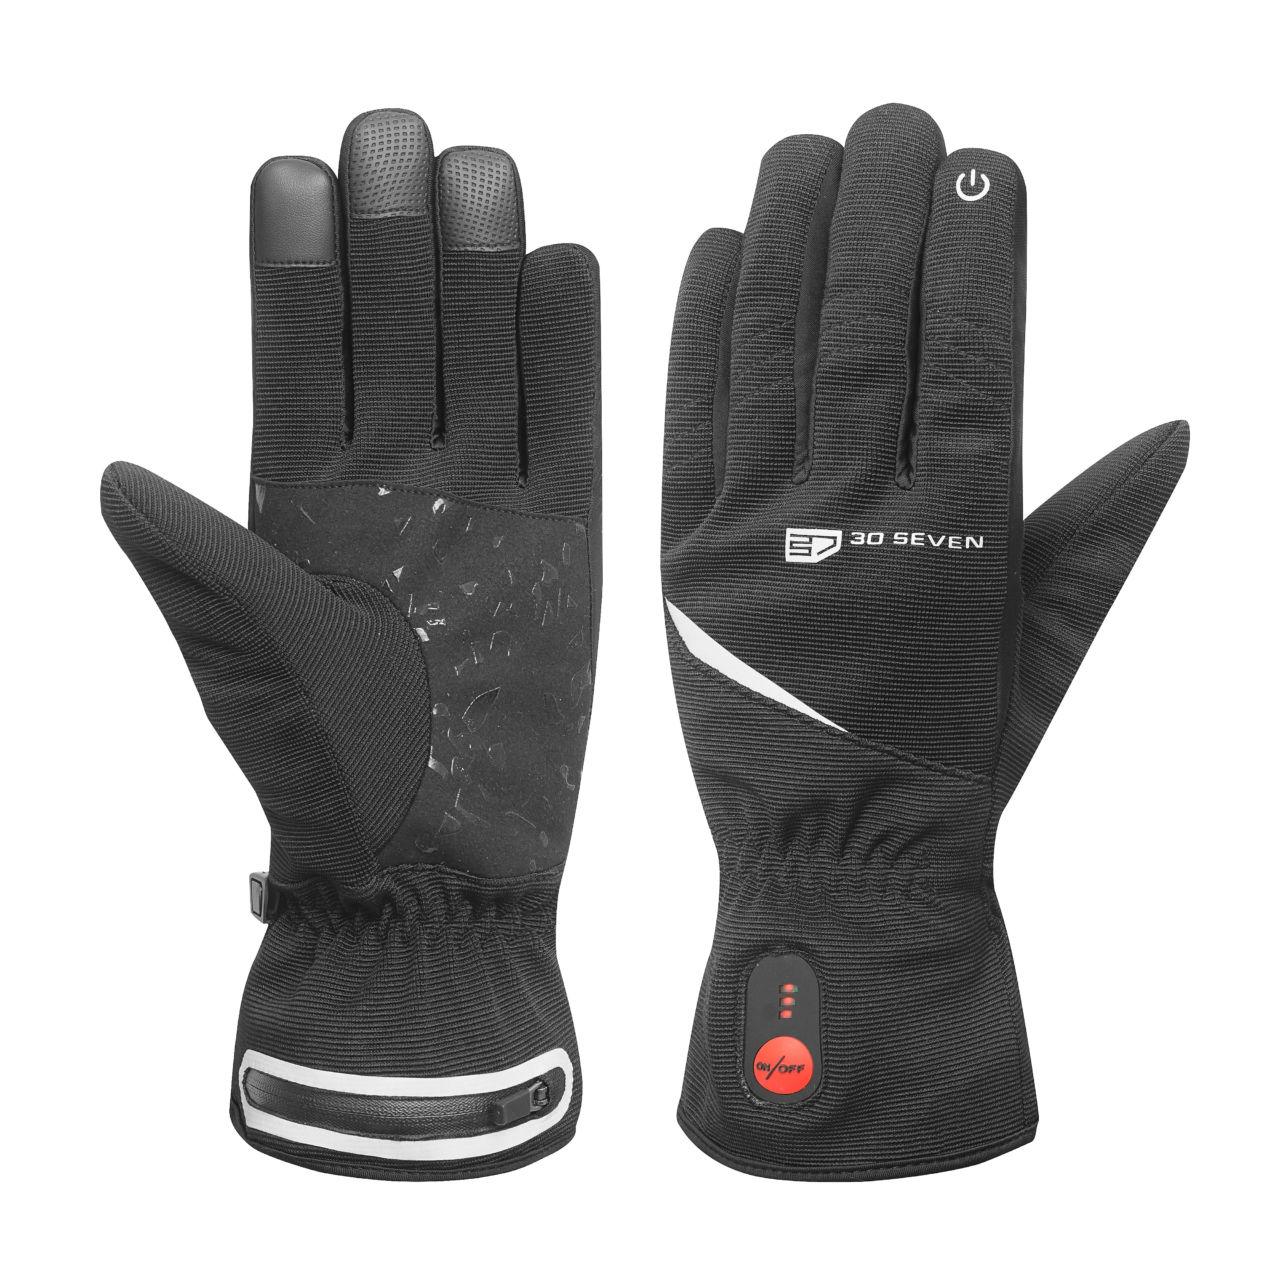 Klettern Handschuhe Fahrradhandschuh Rutschfeste Winterhandschuhe Outdoor Bergsteigen & Klettern Bekleidung